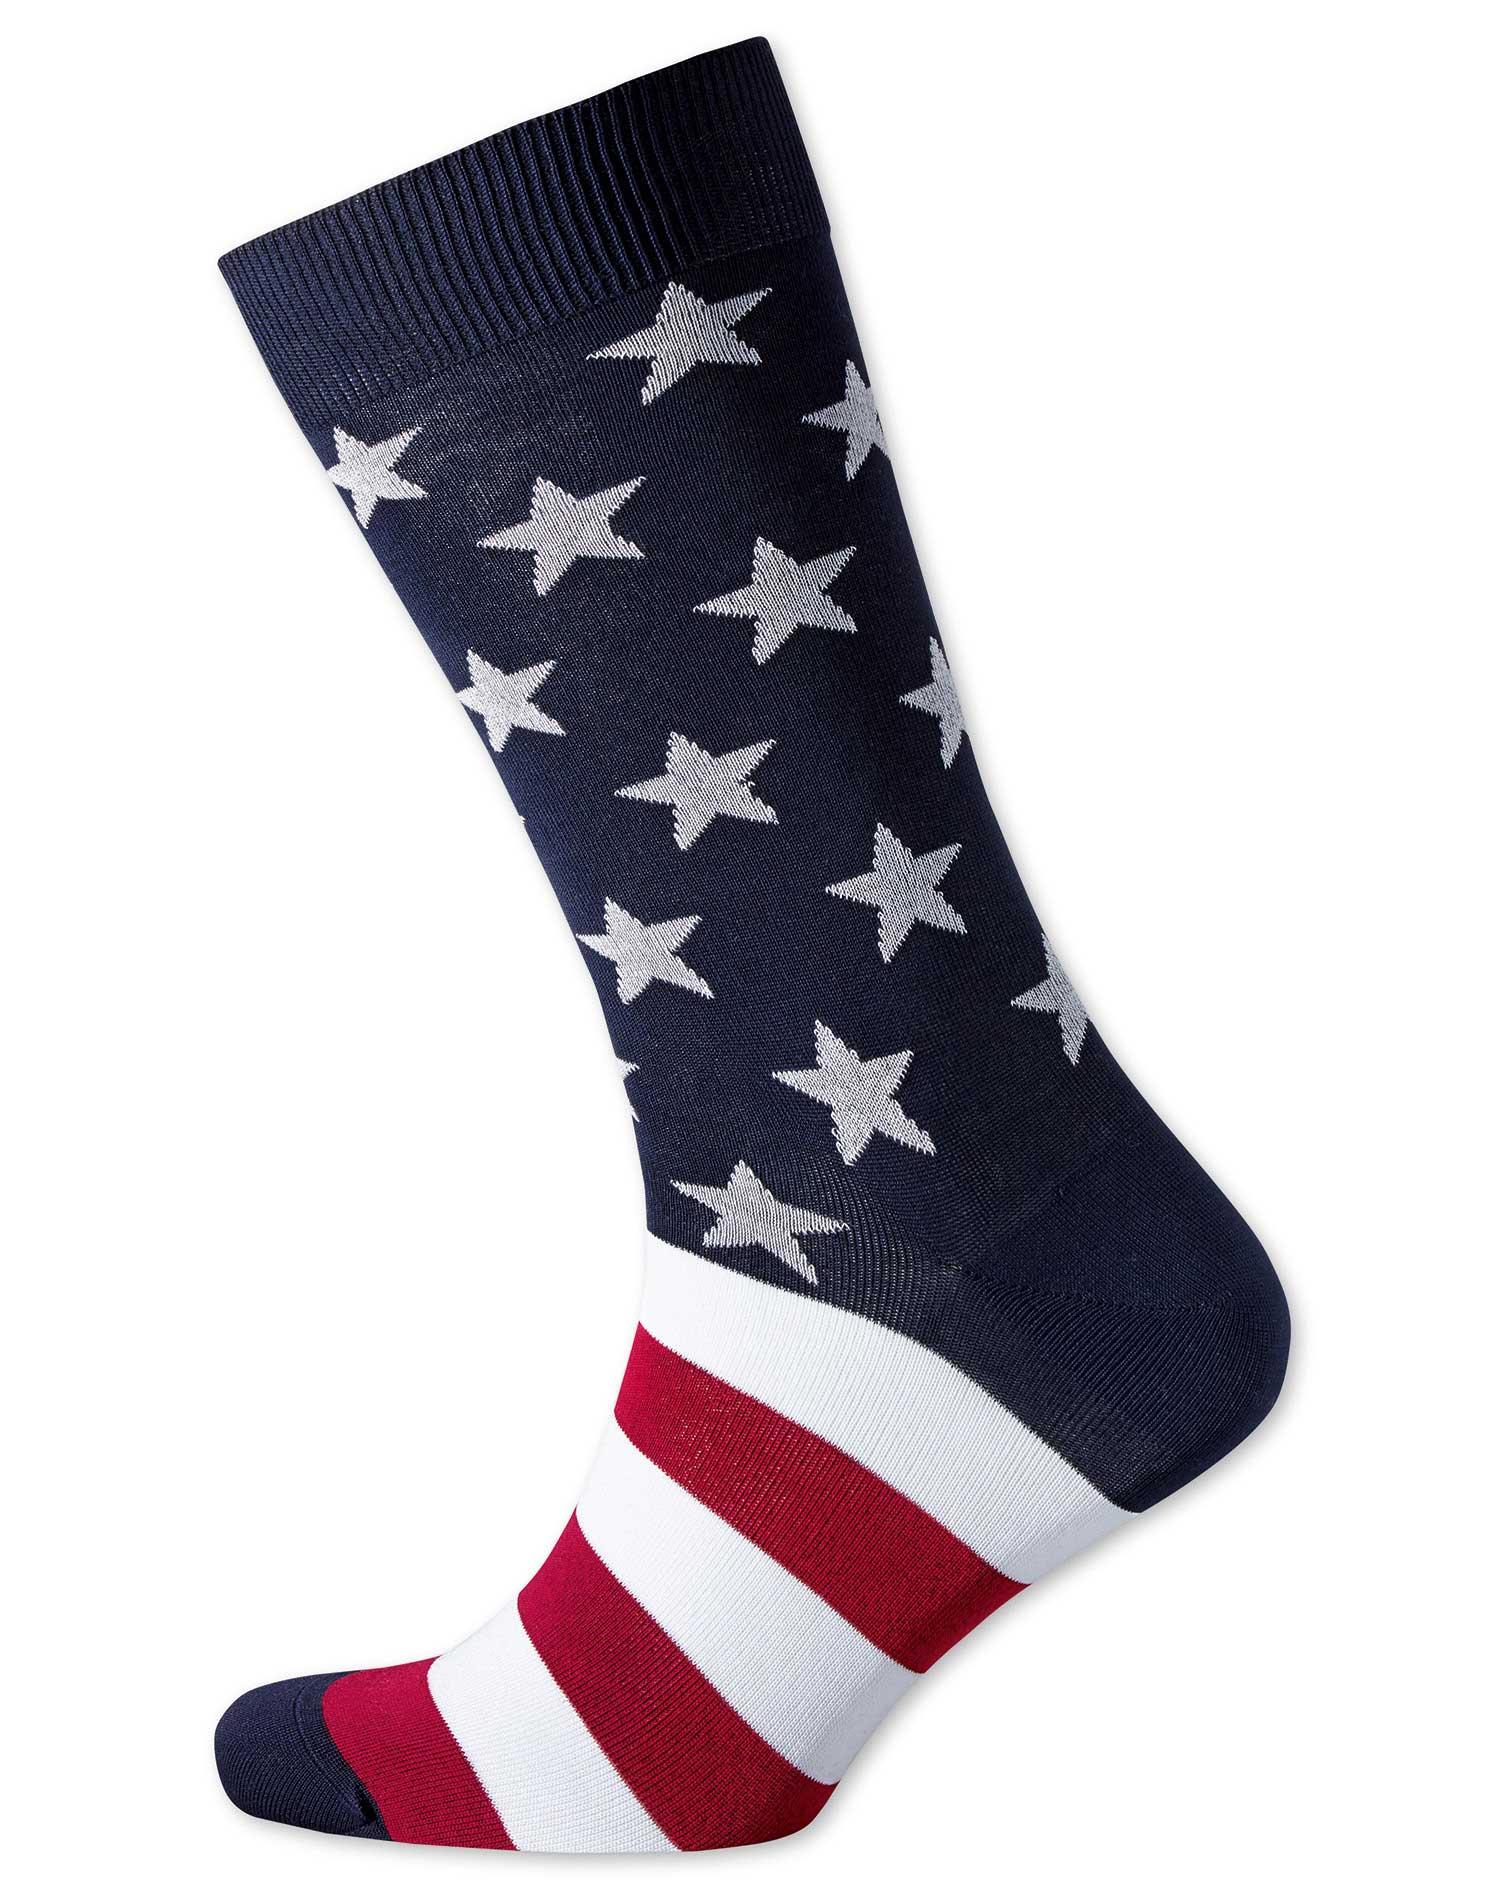 stars and stripes socks size medium by charles tyrwhitt